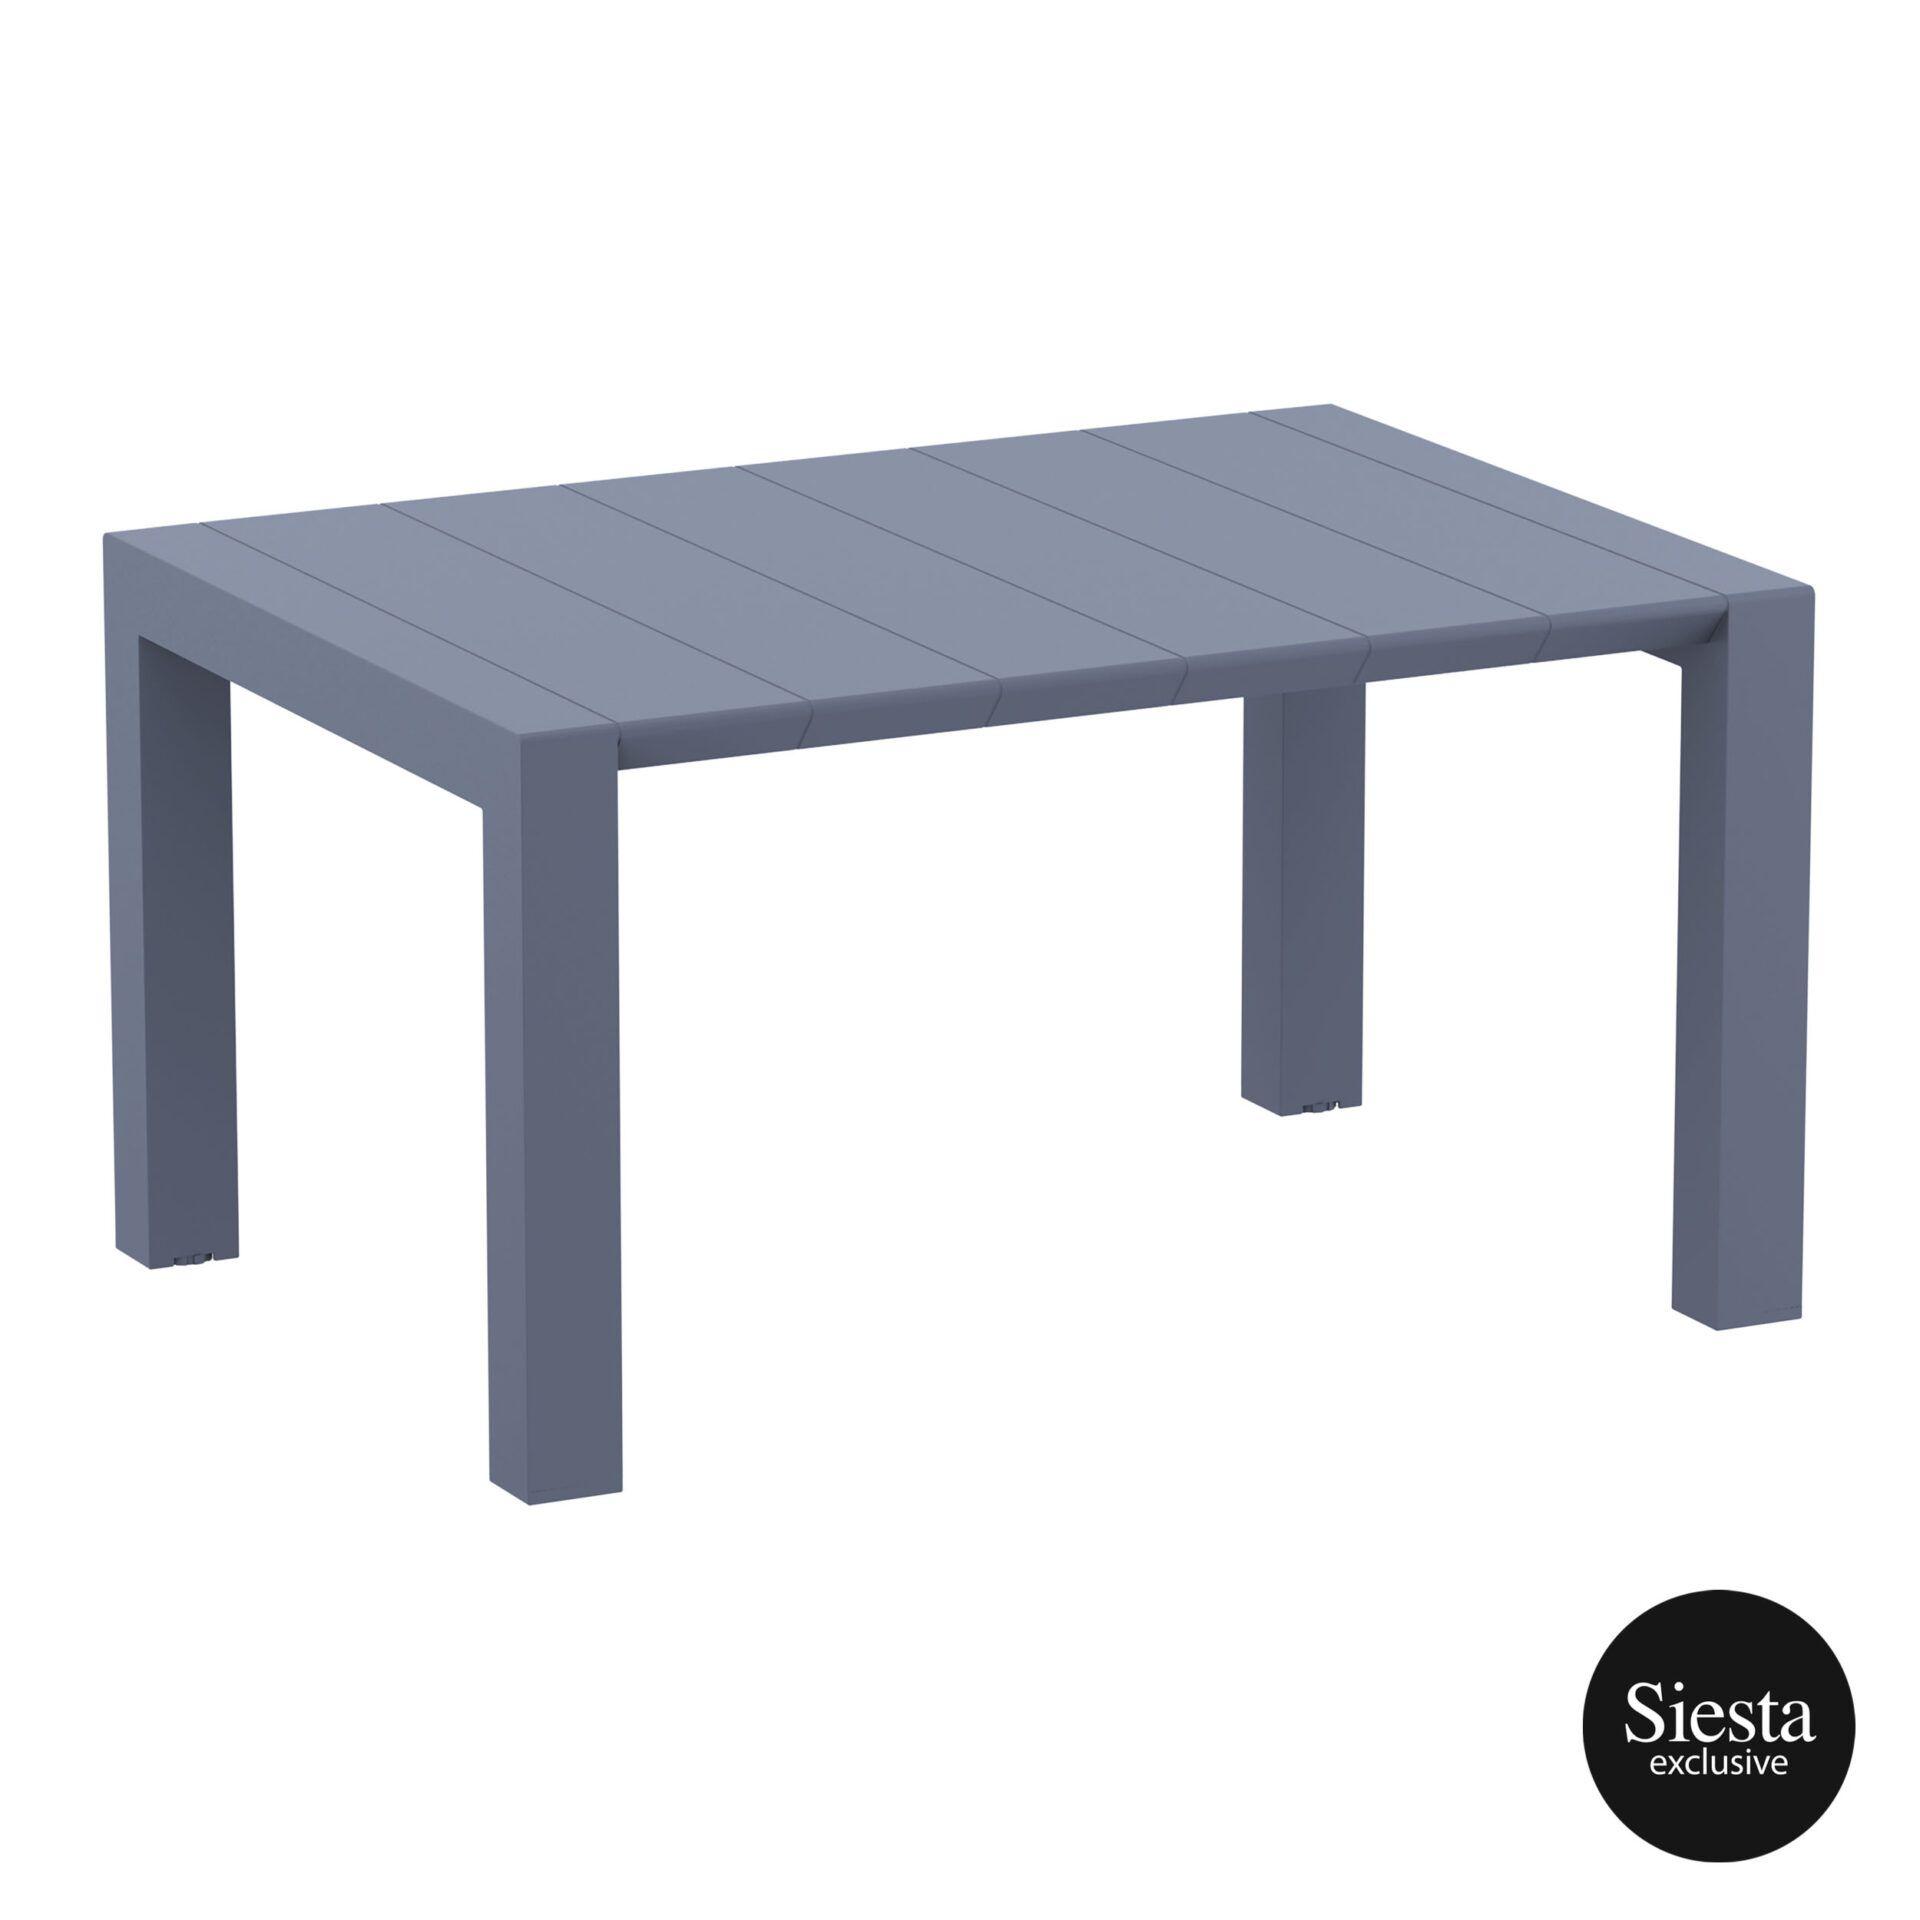 006 vegas table 140 darkgrey front side